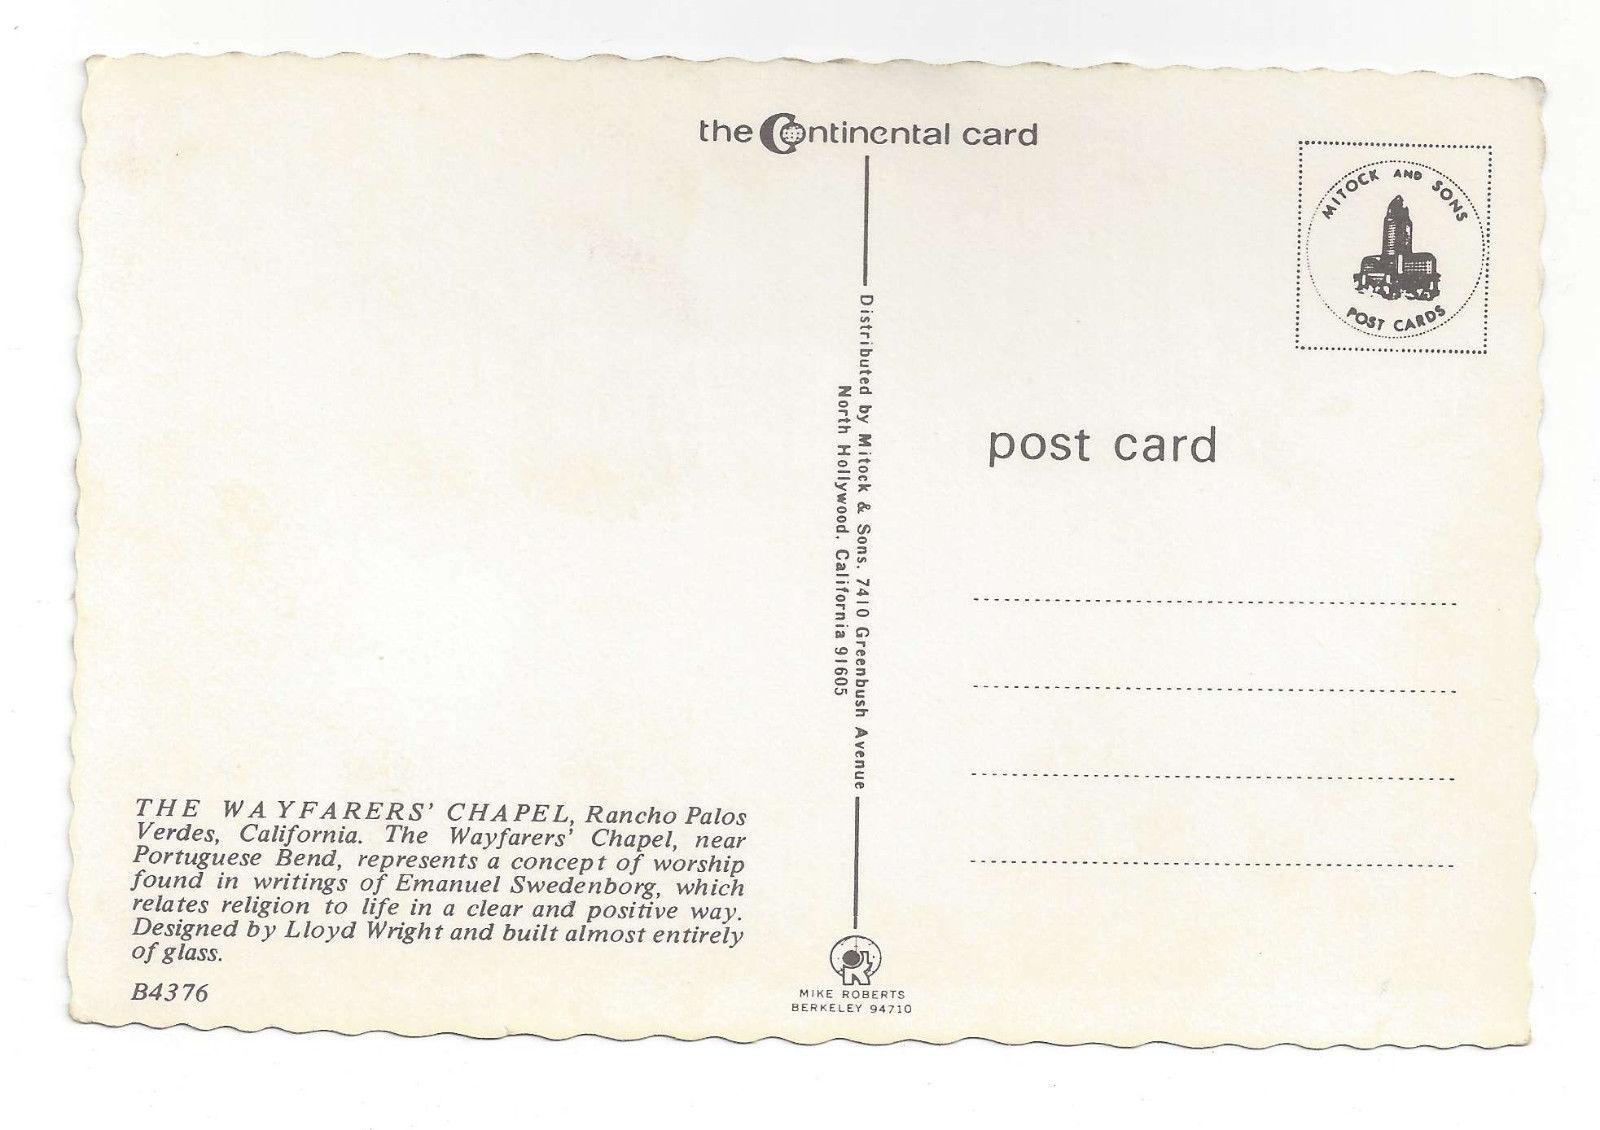 CA Palos Verdes Wayfarers Chapel Lloyd Wright Vtg Mitock Postcard 4X6